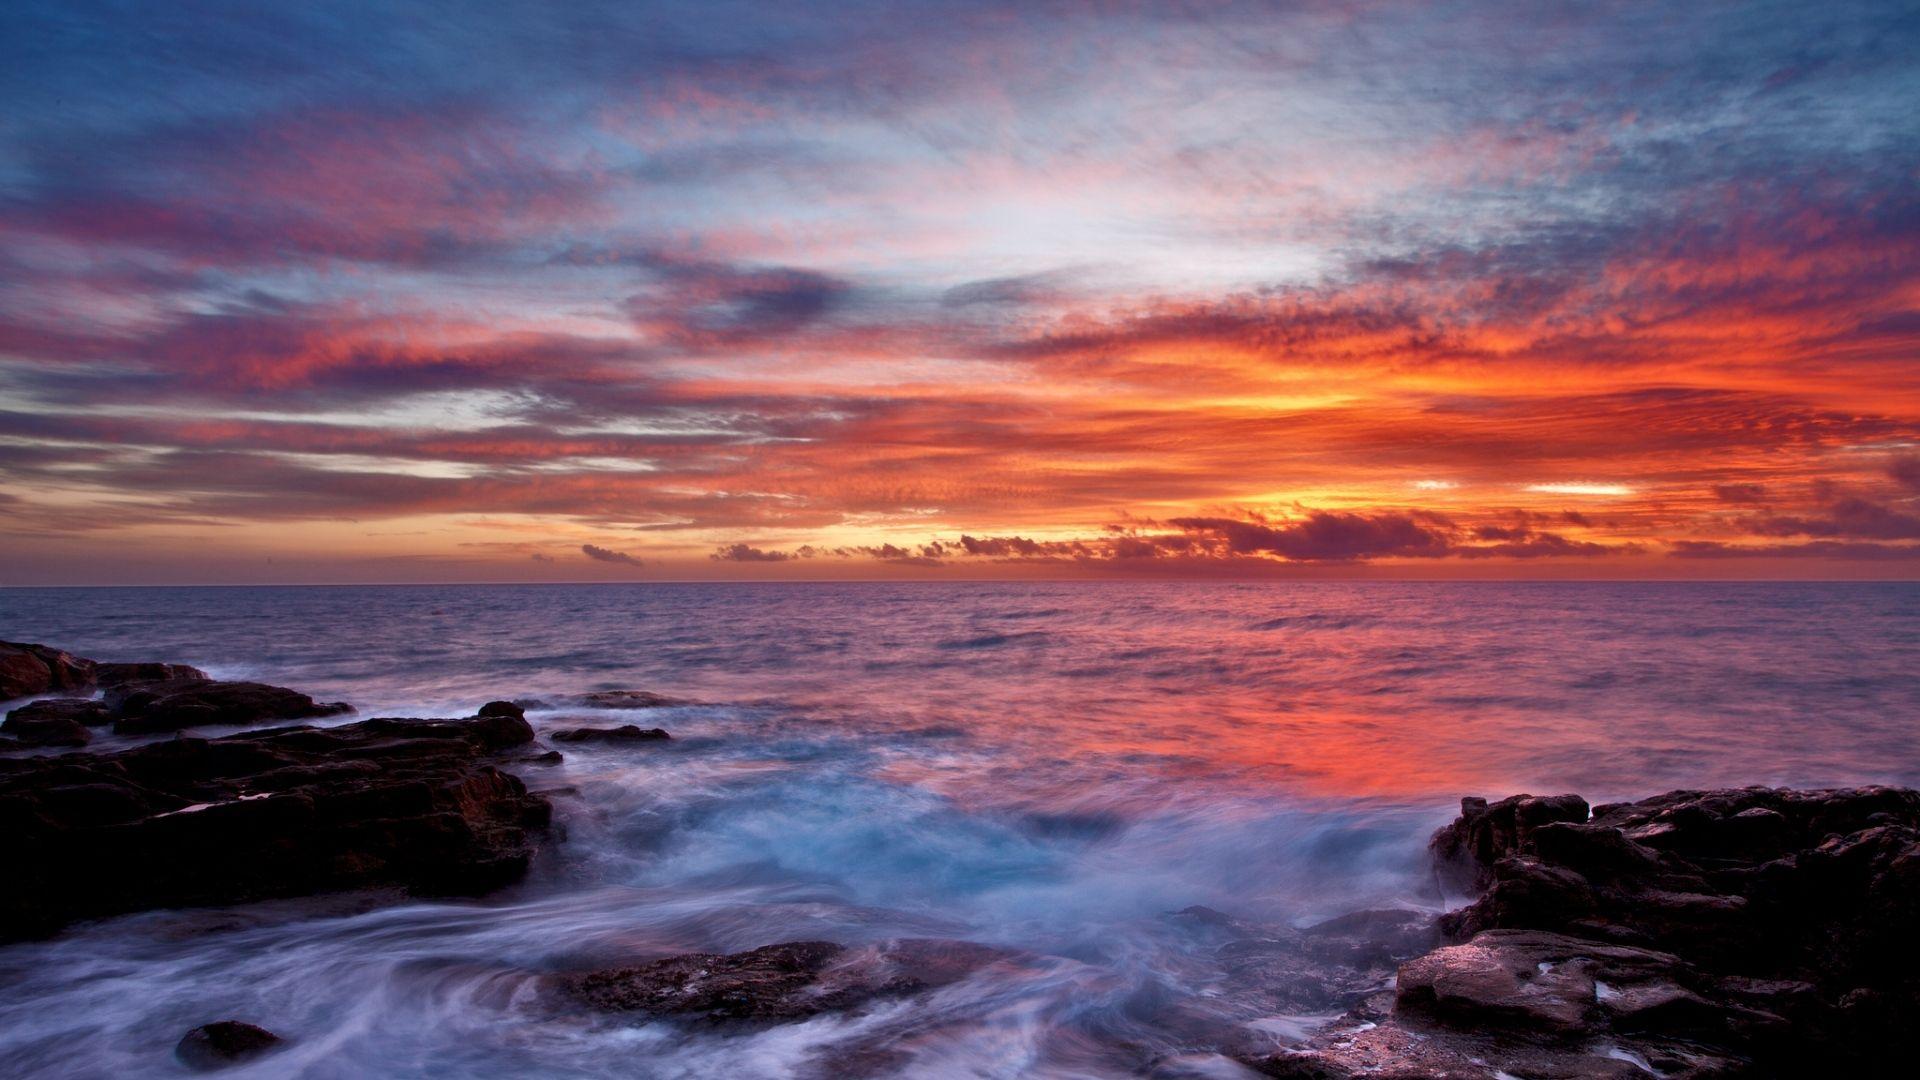 Download Wallpaper 1920x1080 Sea Sky Sunset Clouds Rocks Surf Full Hd 1080p Hd Background Seascape Photography Water Sunset Sunset Wallpaper rocks sea houses sunset sky